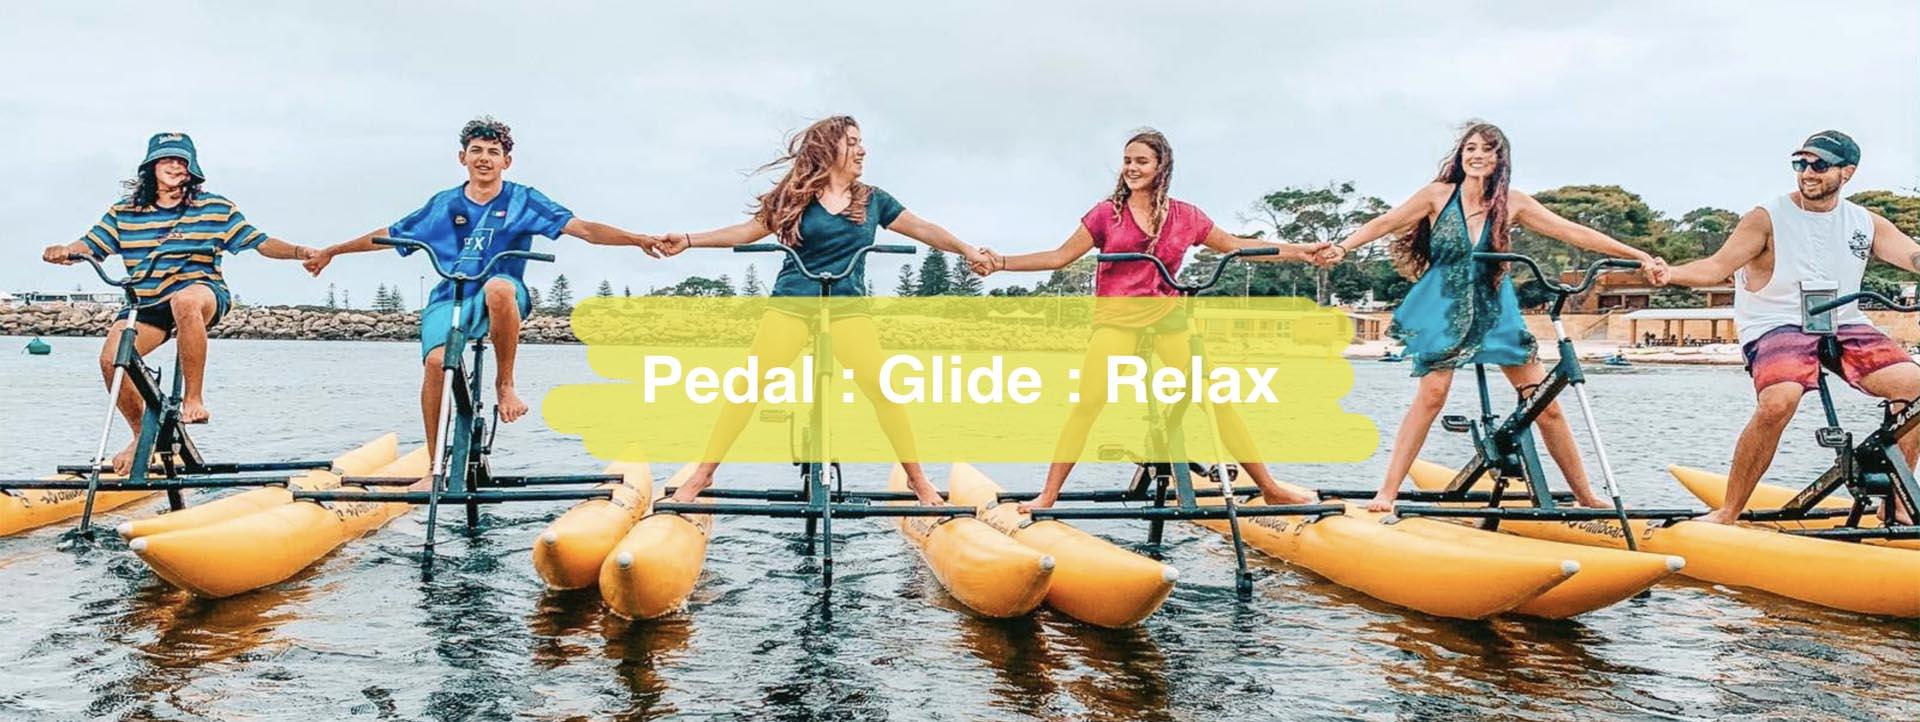 Perth peddle water bikes